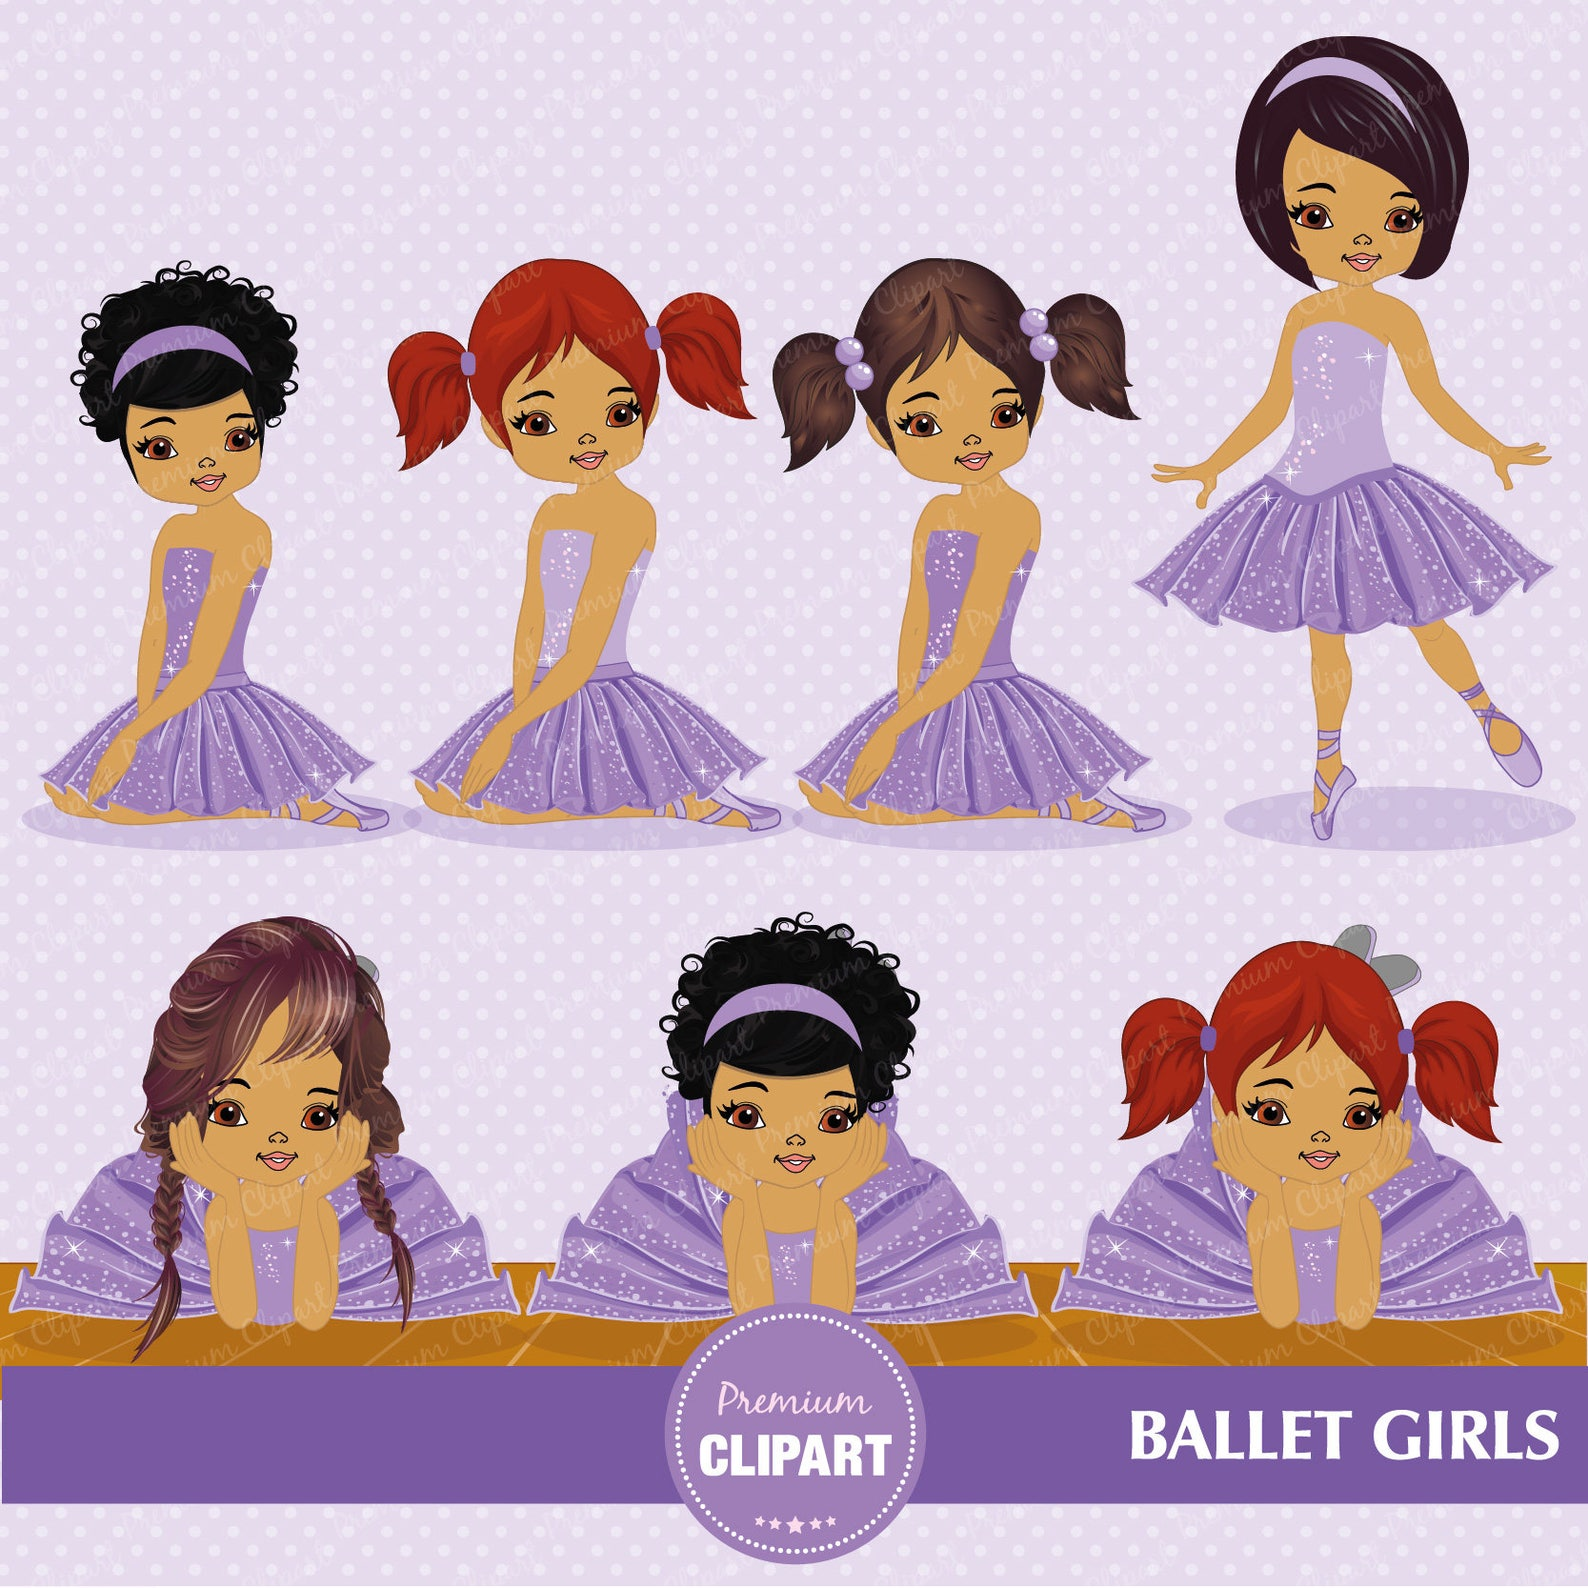 ballerina clipart, ballerina clip art, african american ballerina, ballet clipart, ballerina invitation, commercial use - ca317